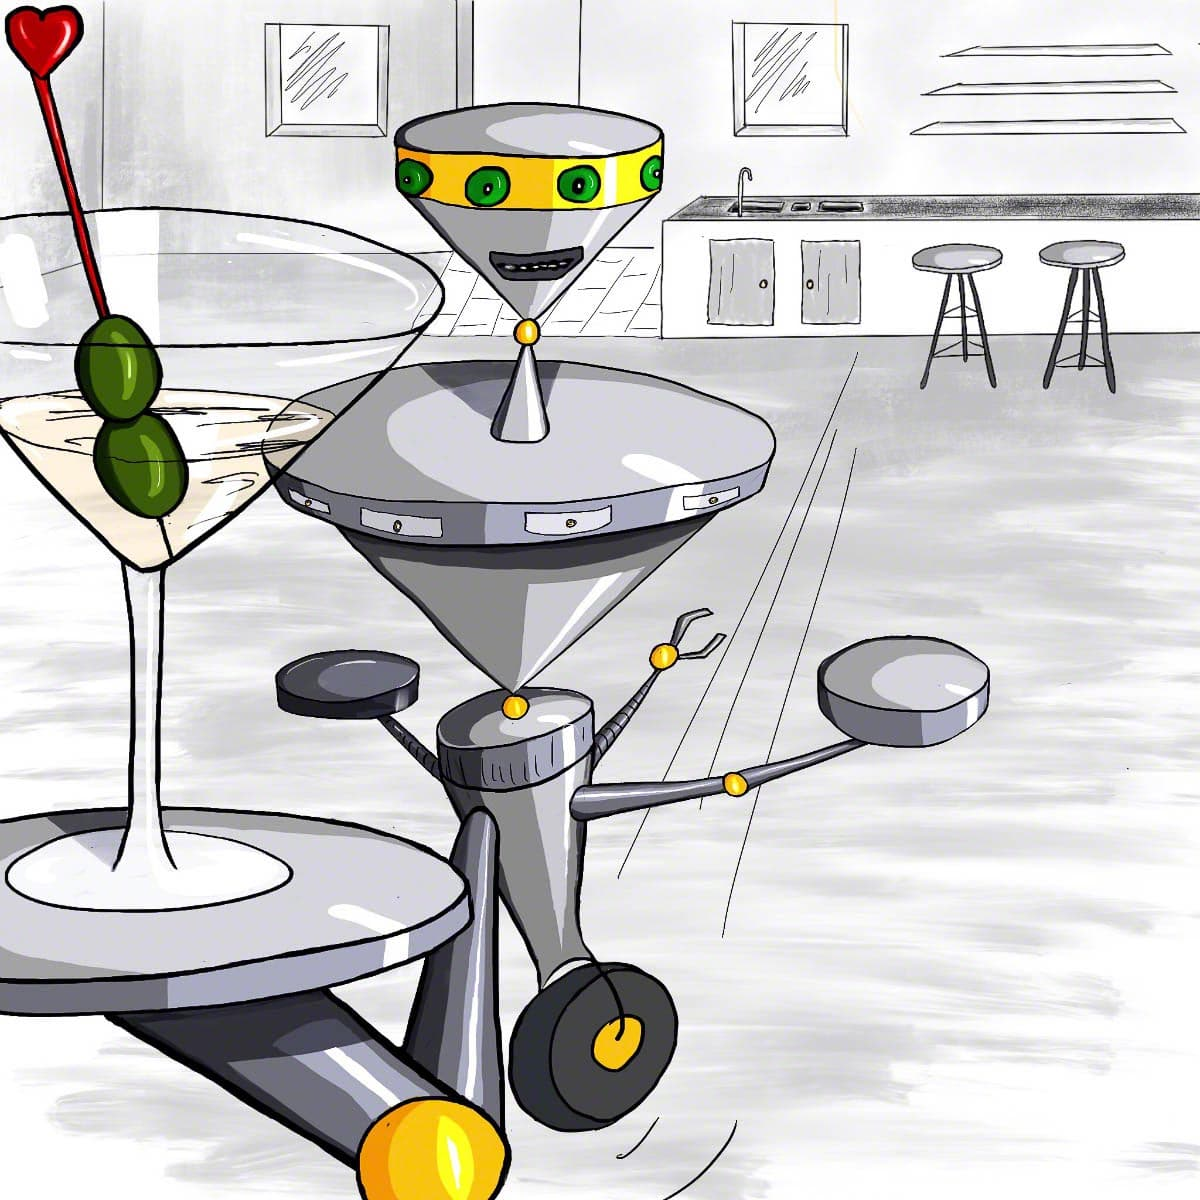 illustration, drawing, robot